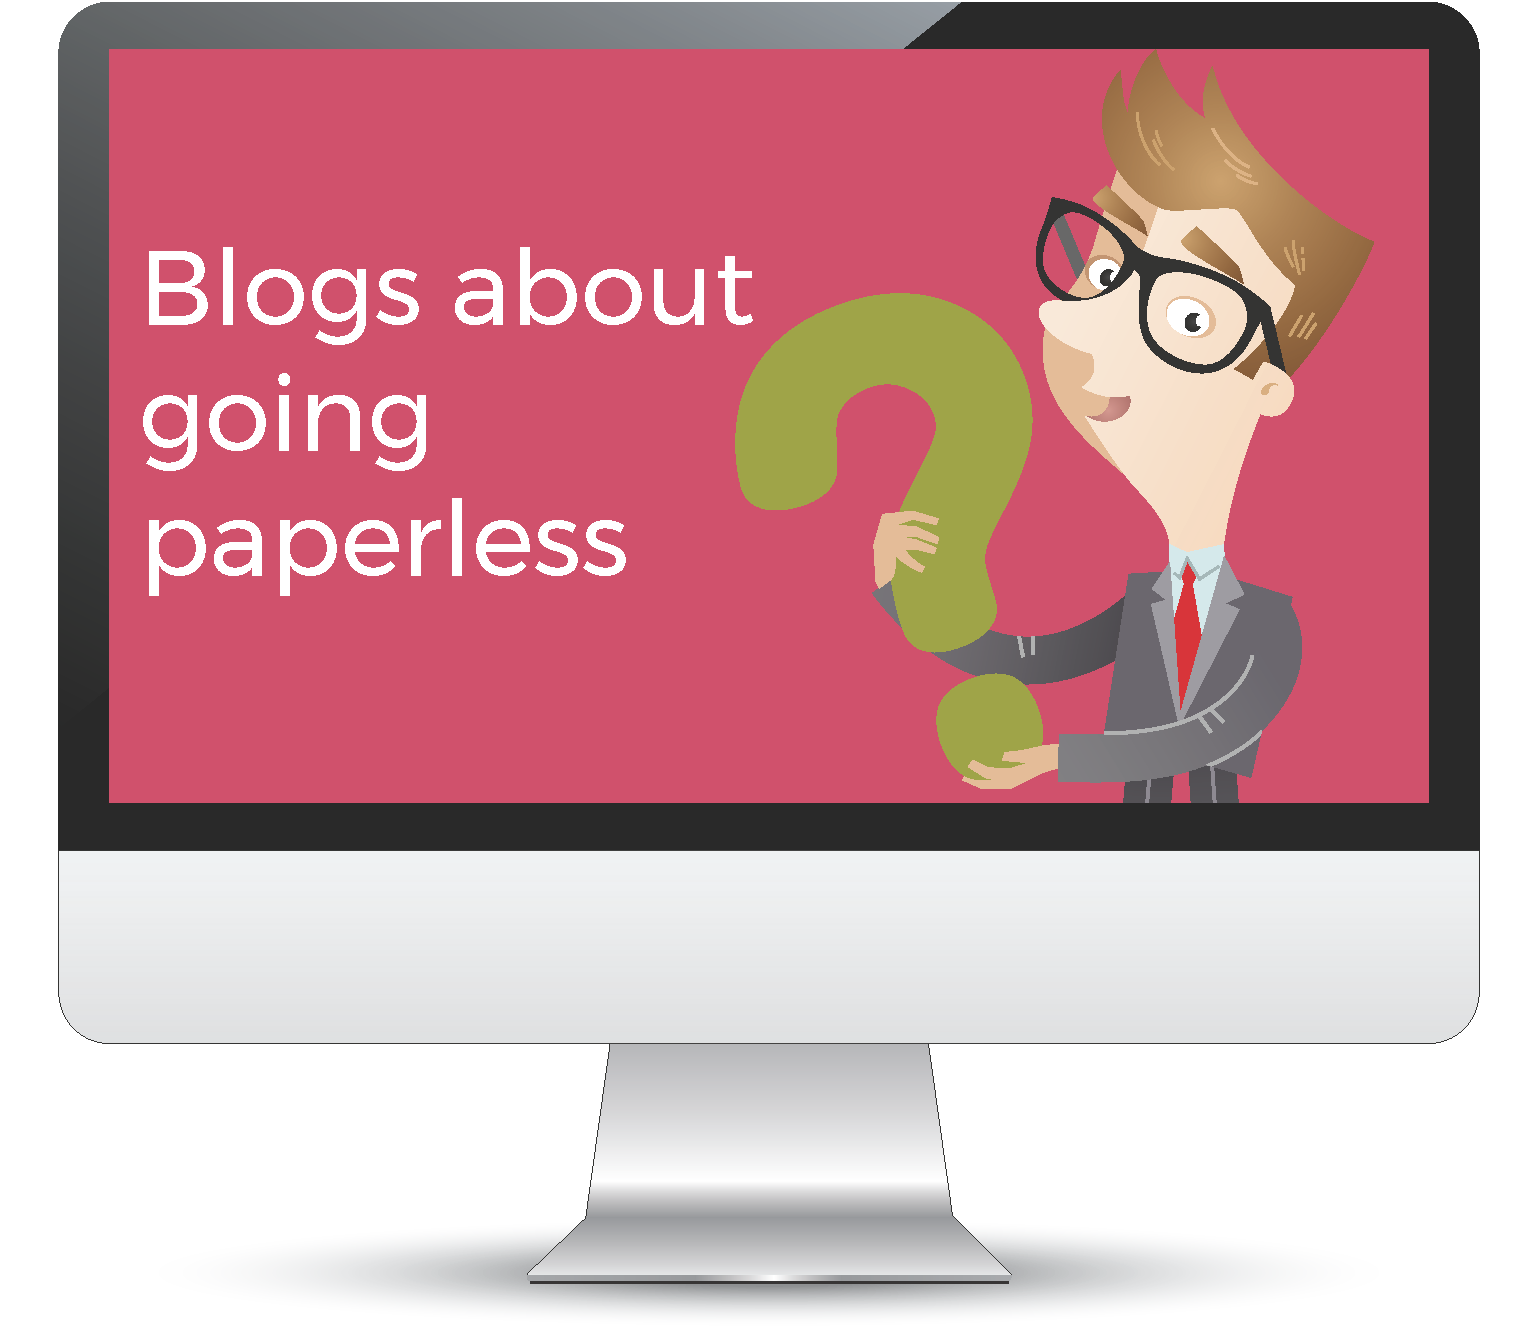 Paperless blogs